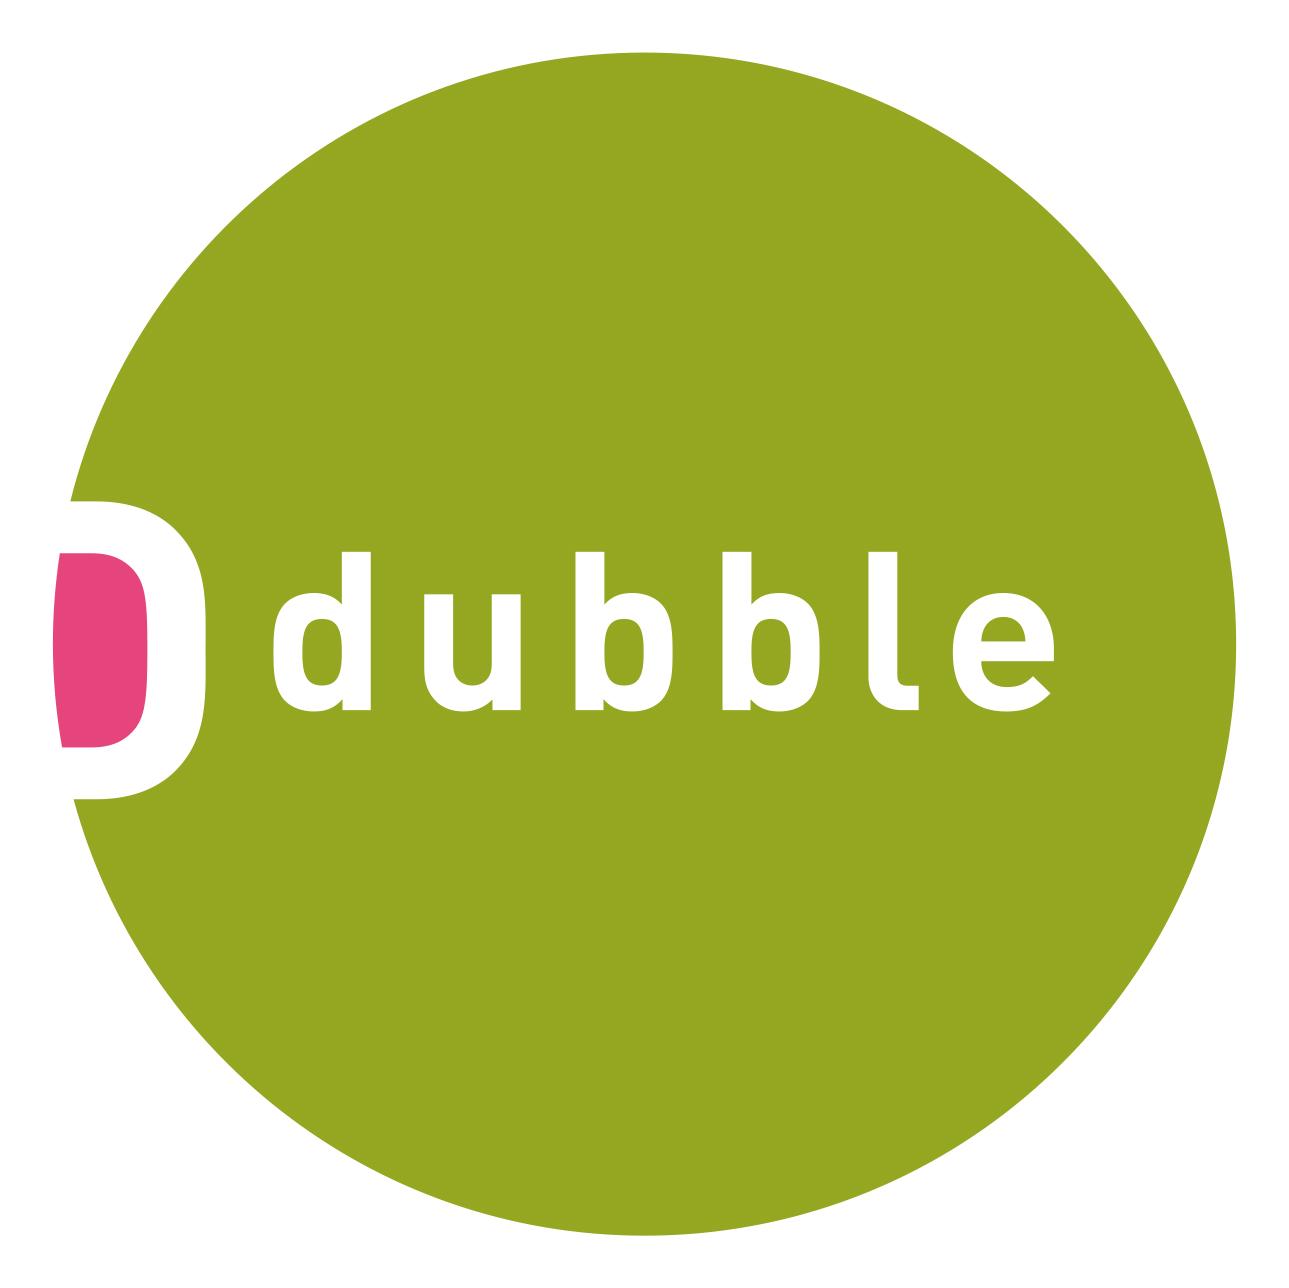 Dubble Food